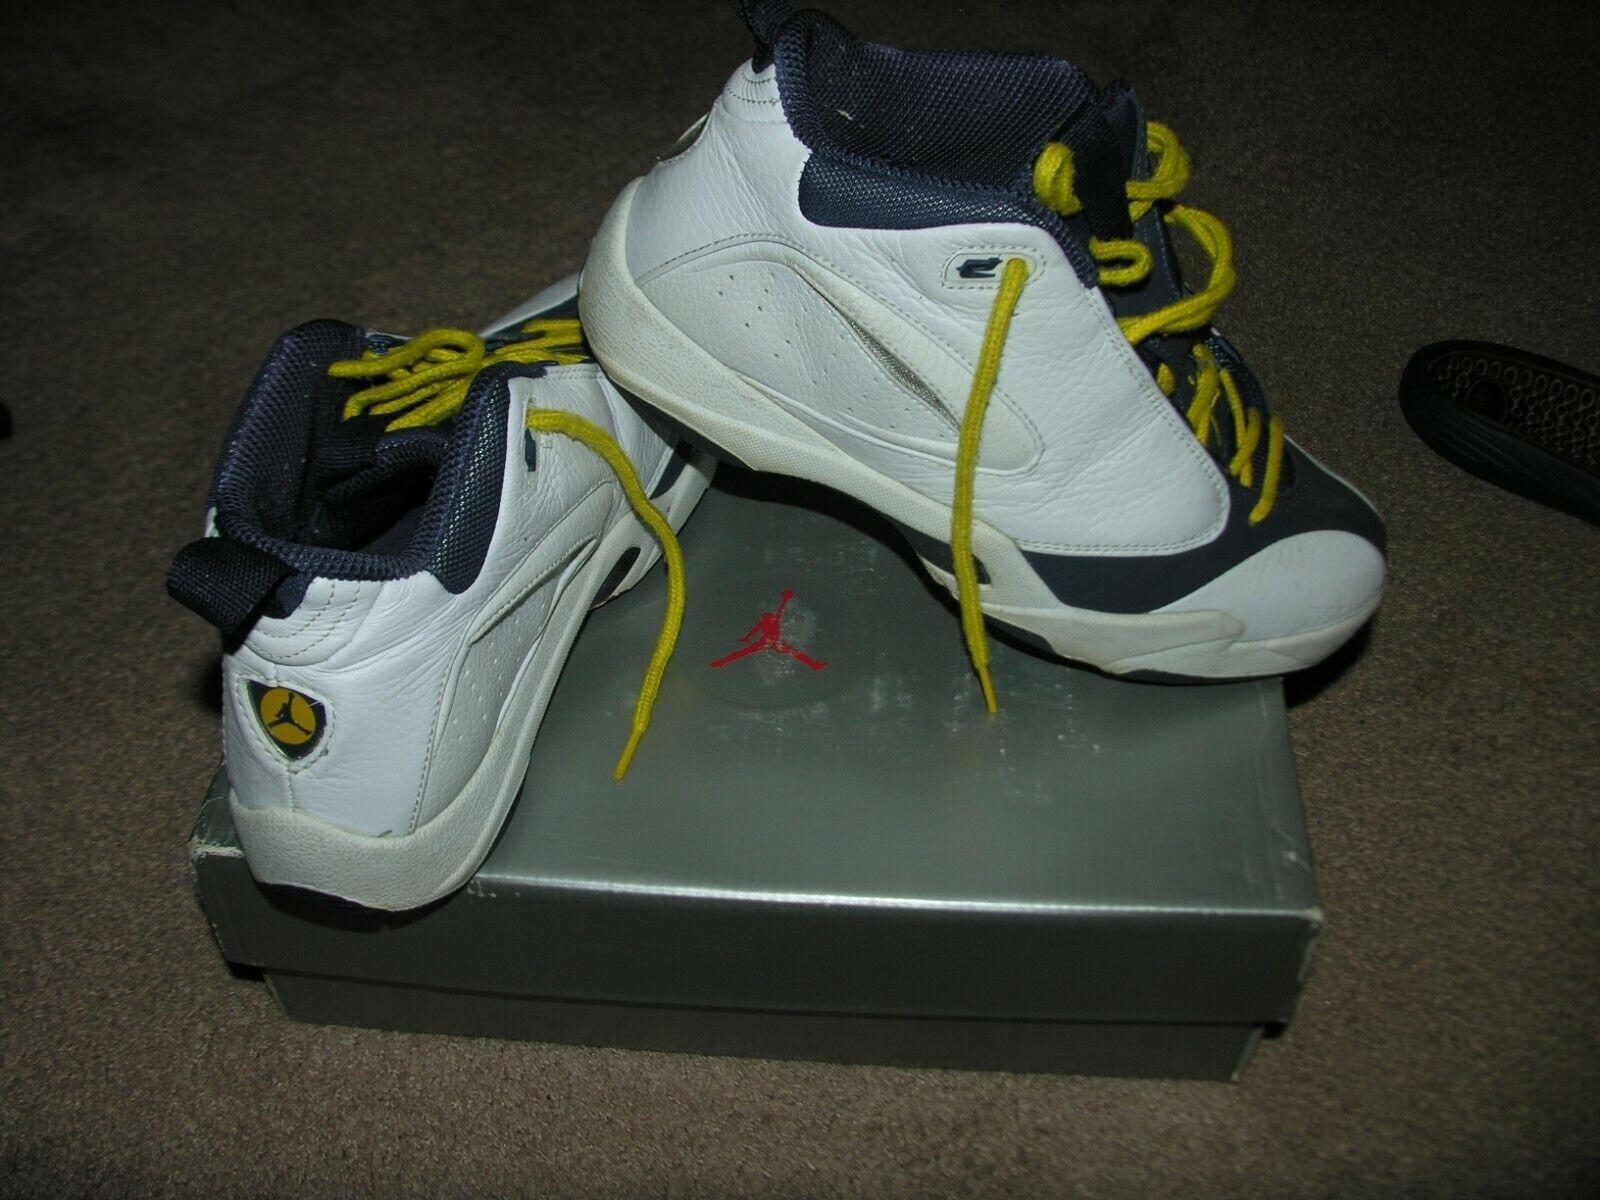 Jumpman quick 6 1998 size 7.5 bluee white yellow original box